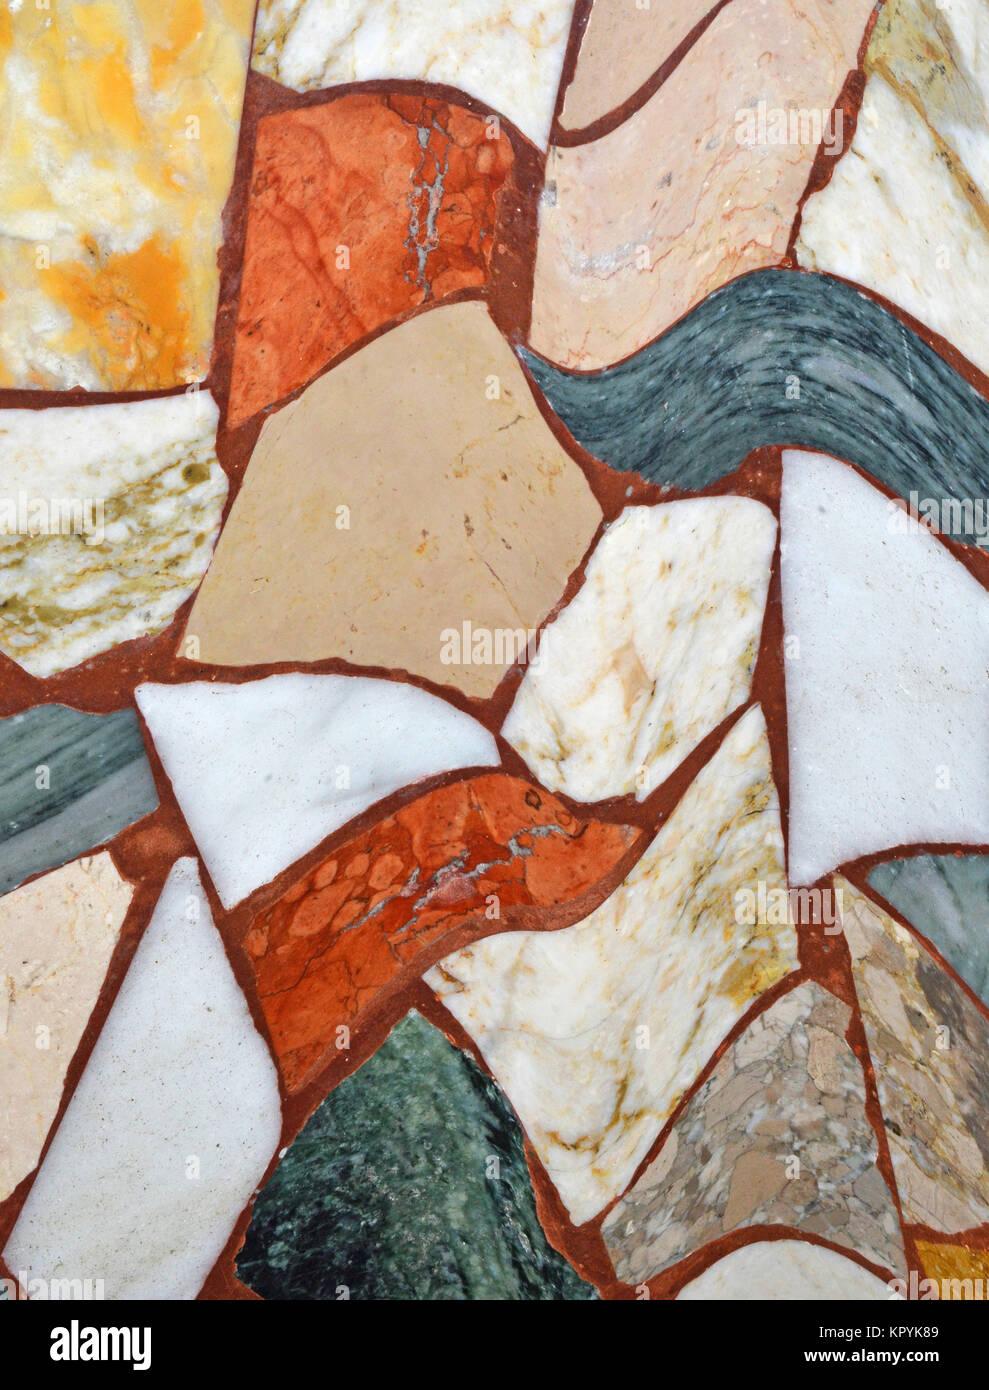 stones mosaic background texture pattern - Stock Image